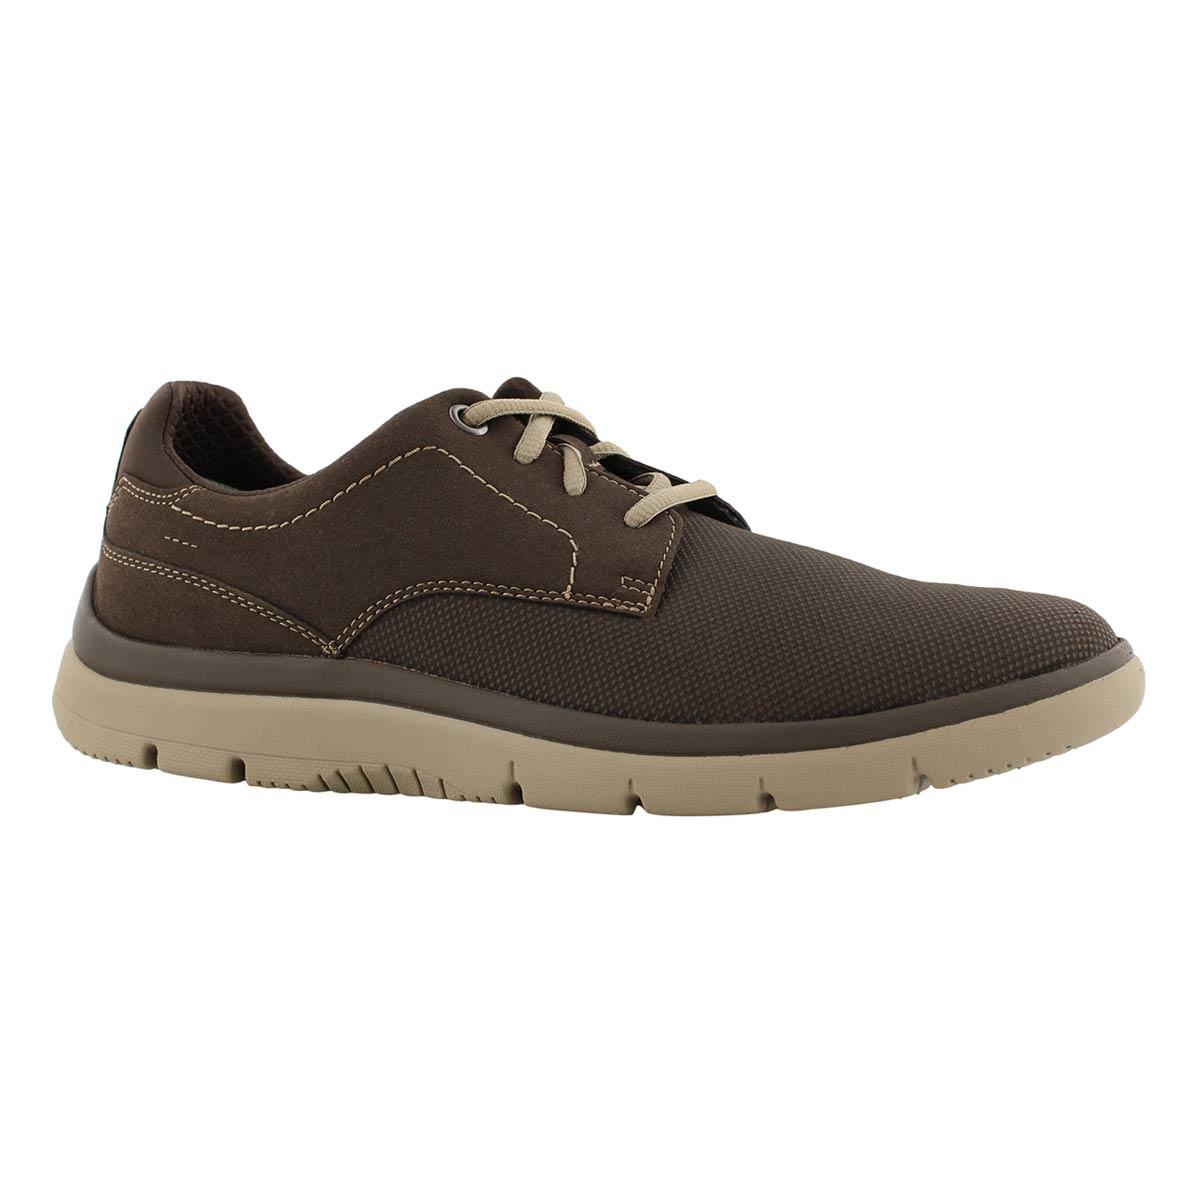 Mns Tunsil Plain brn lace up casual shoe